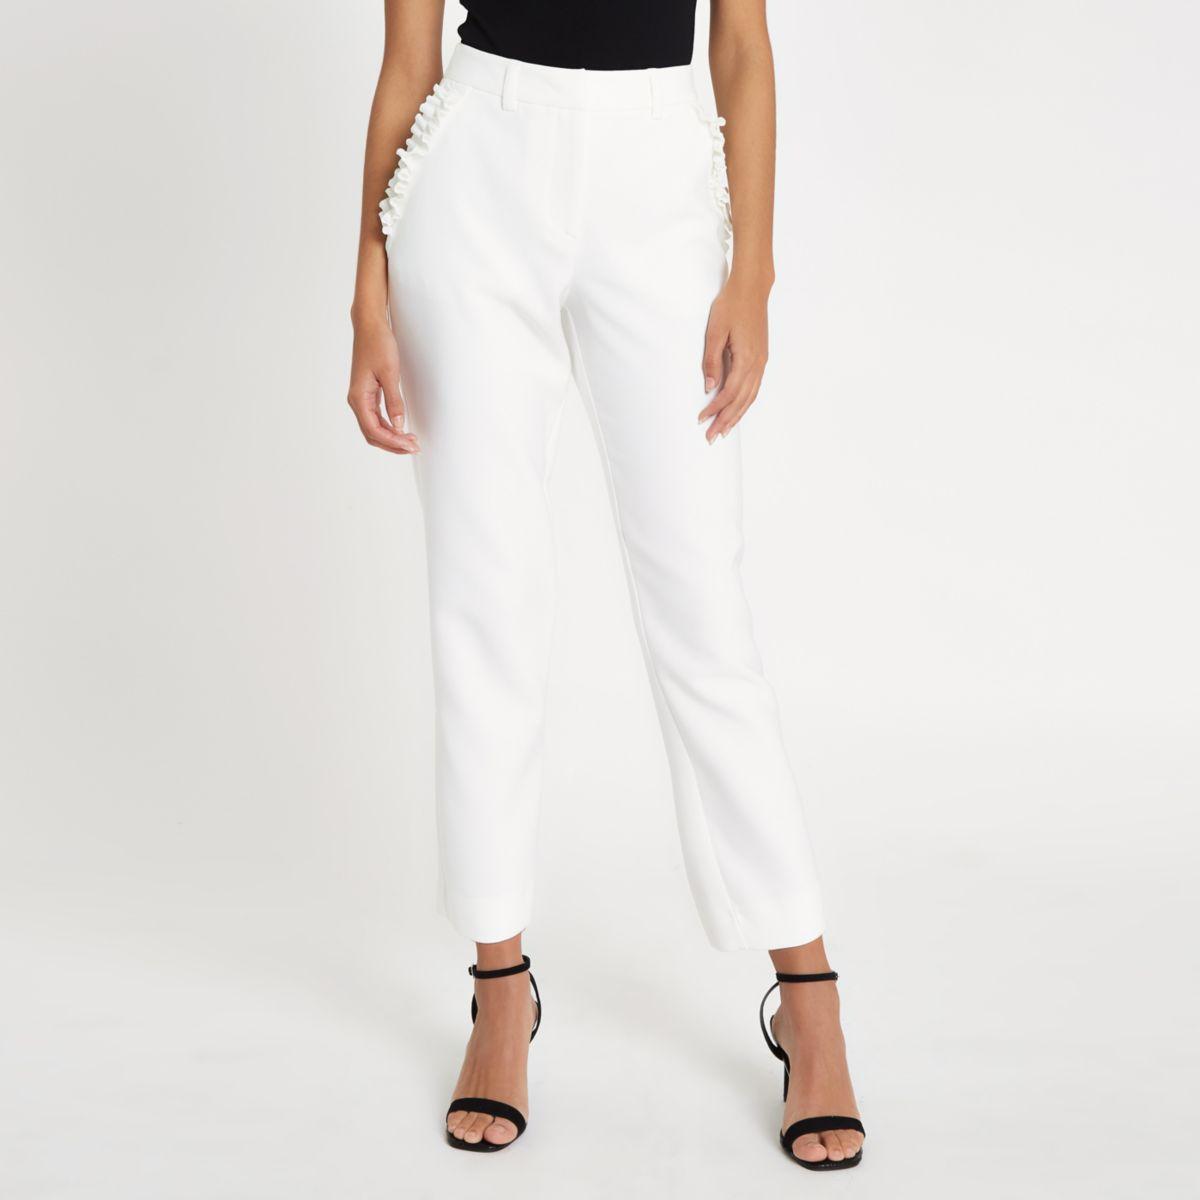 White frill pocket cigarette trousers